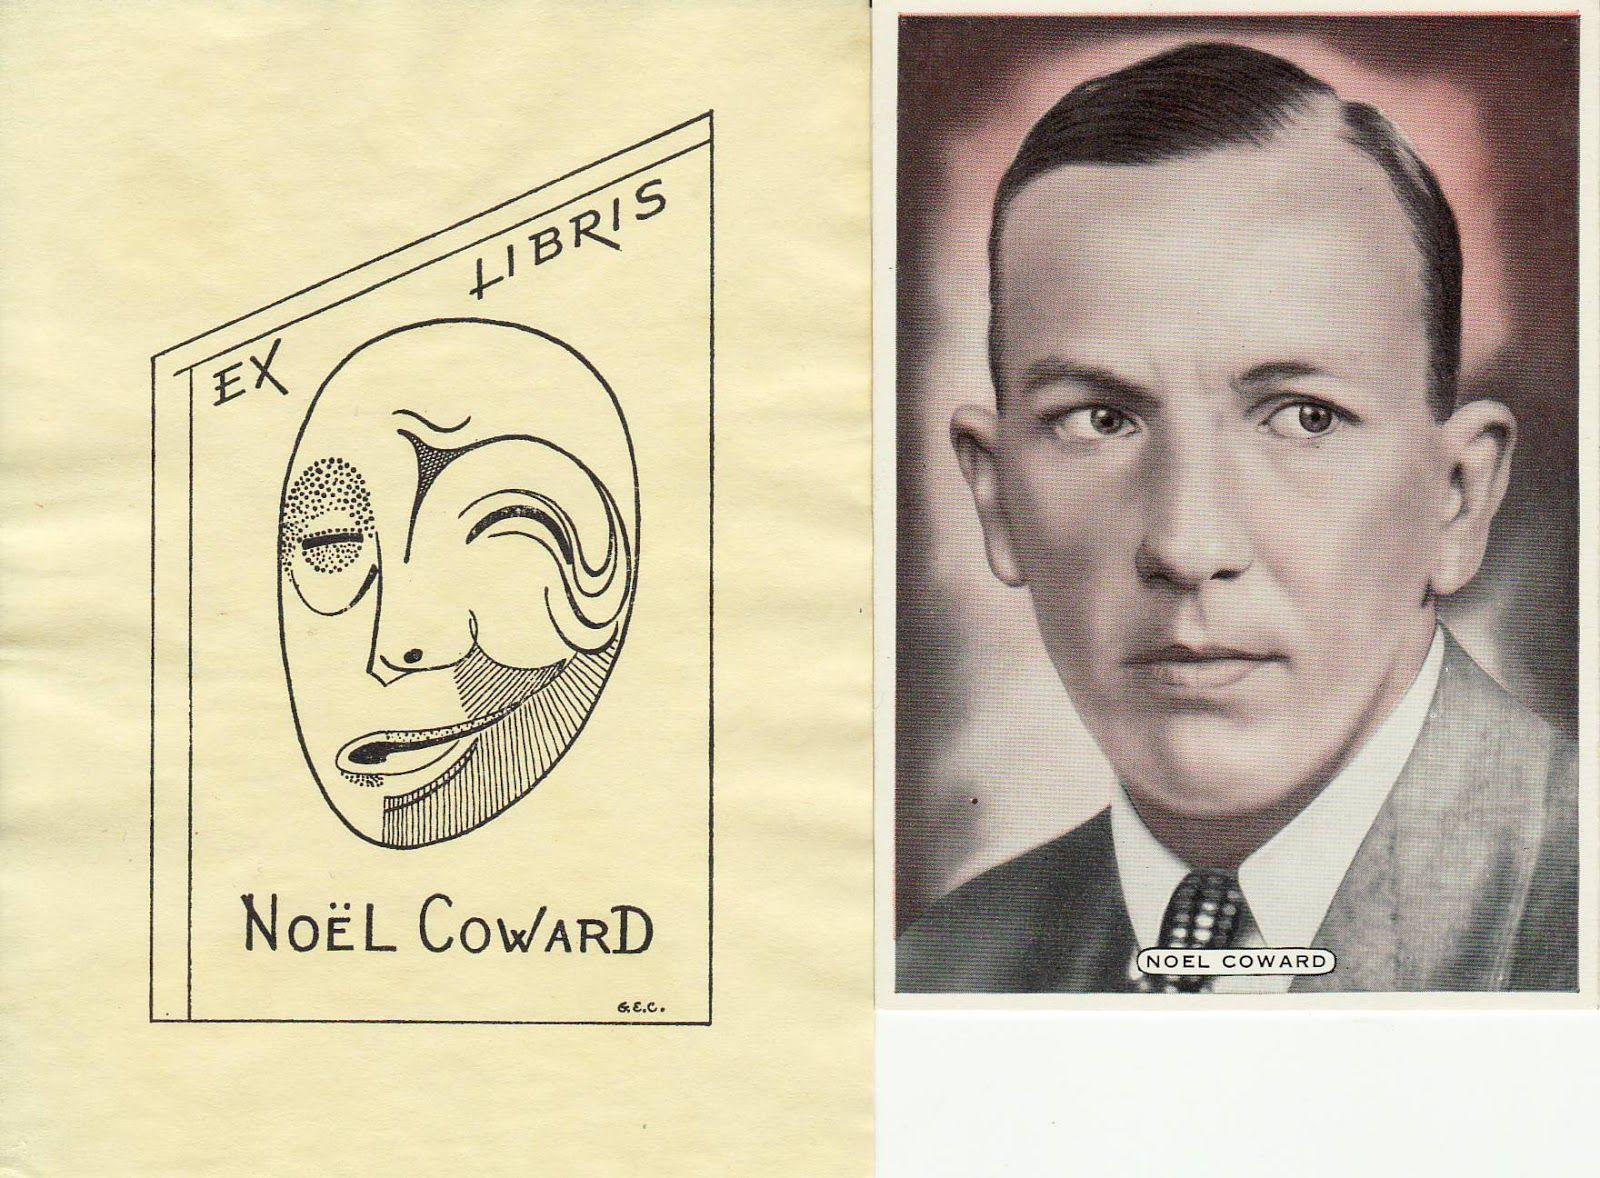 noel coward theater